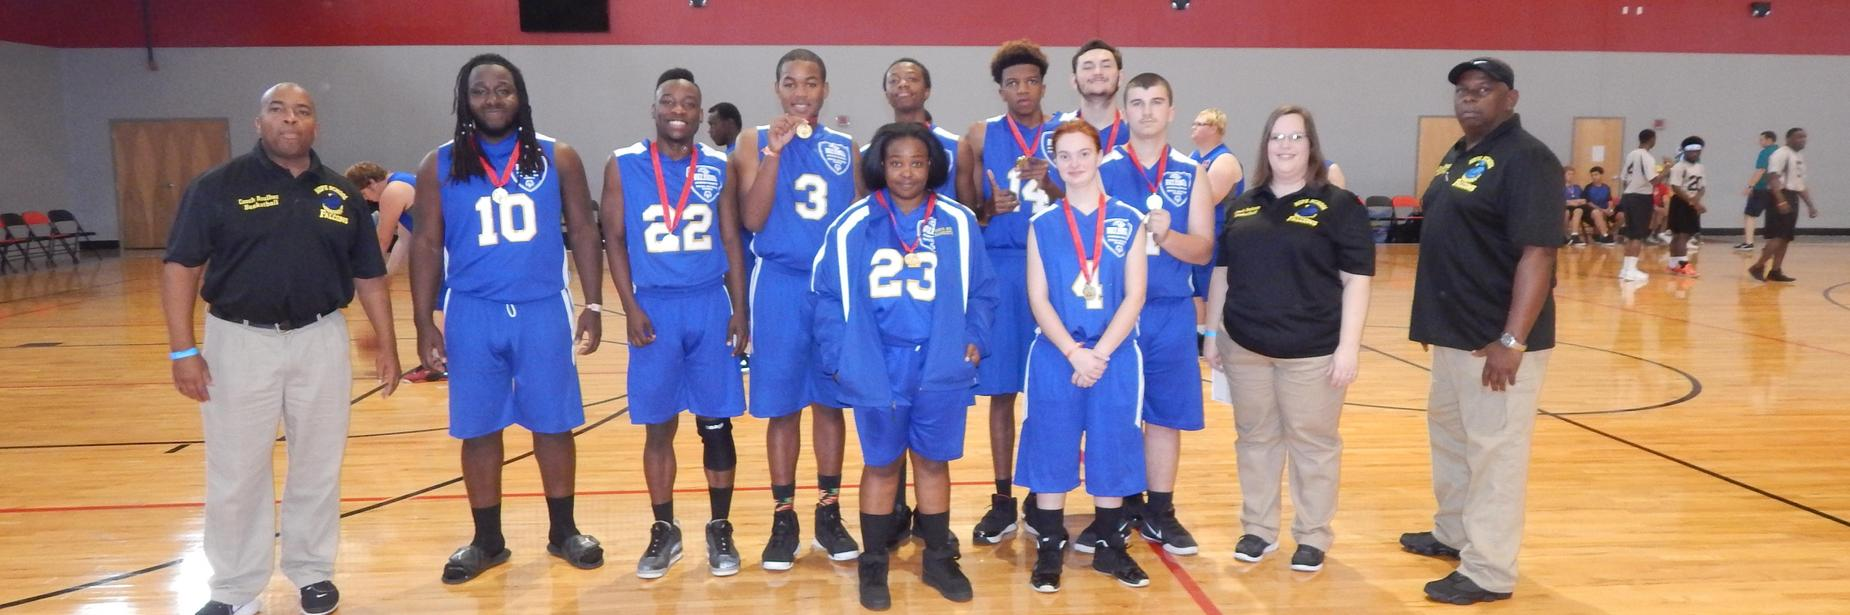 hope basketball team